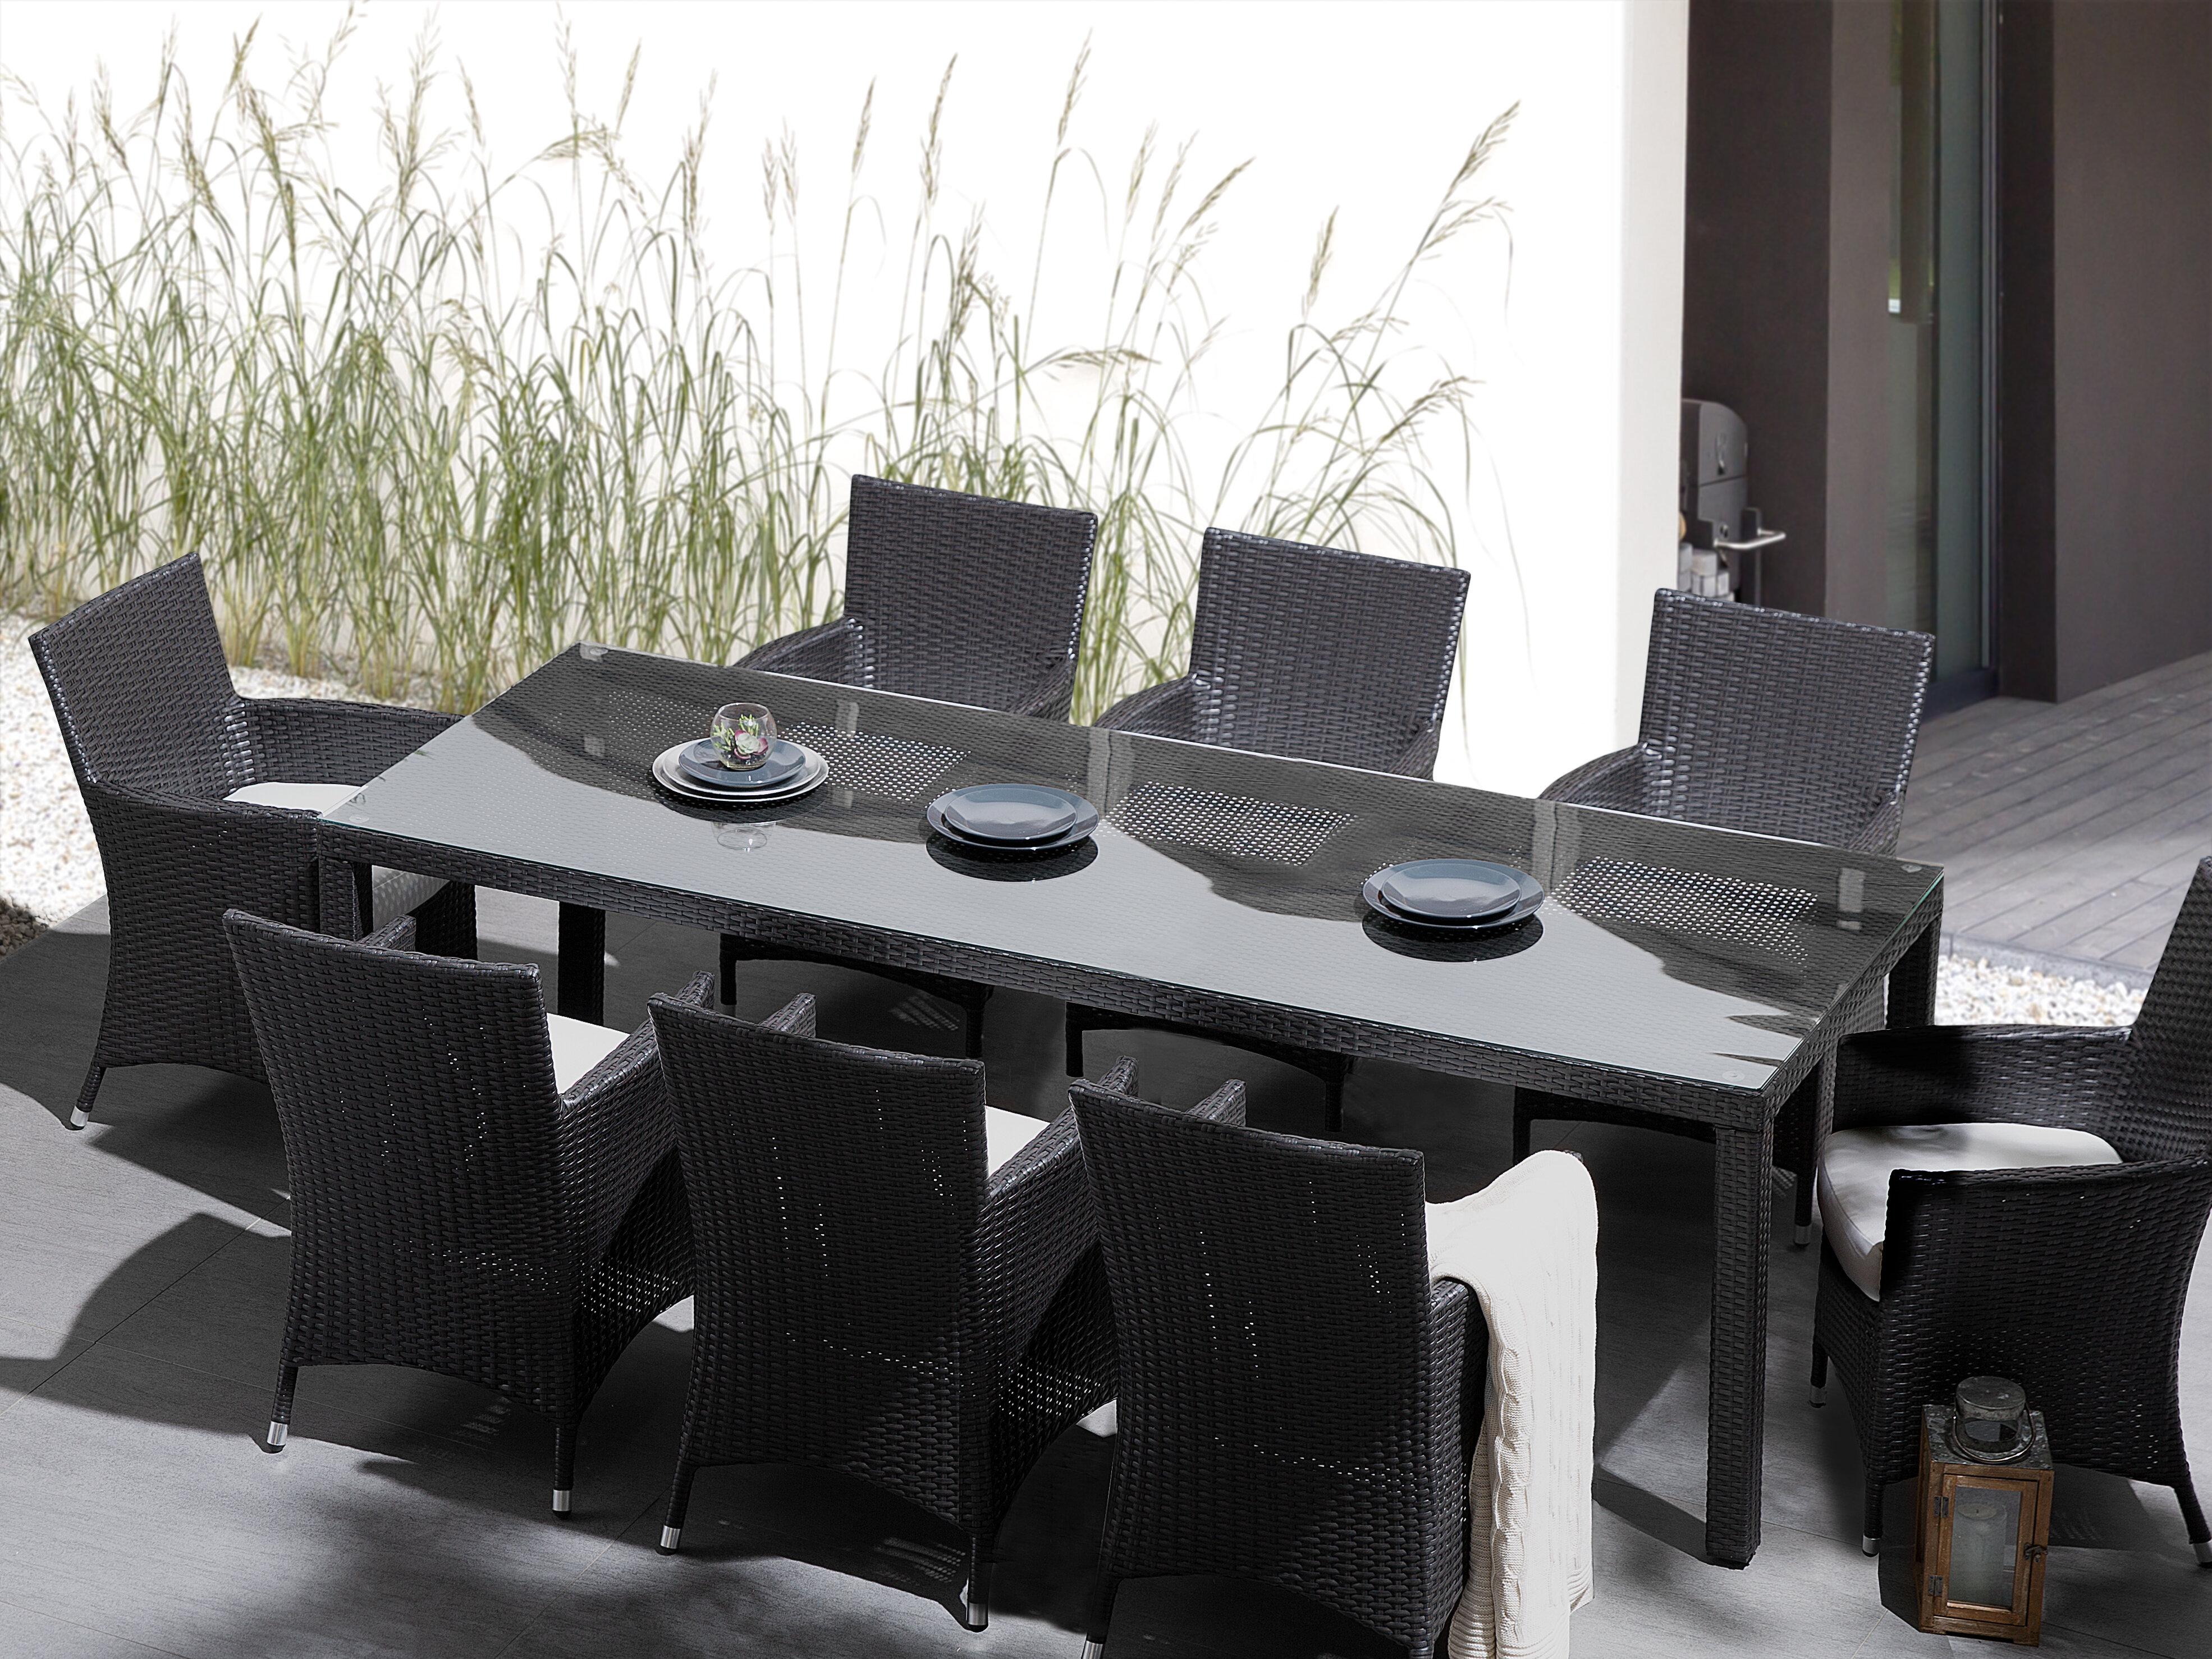 986ab8c5dc0f9 Brayden Studio Navy 9 Piece Dining Set with Cushions